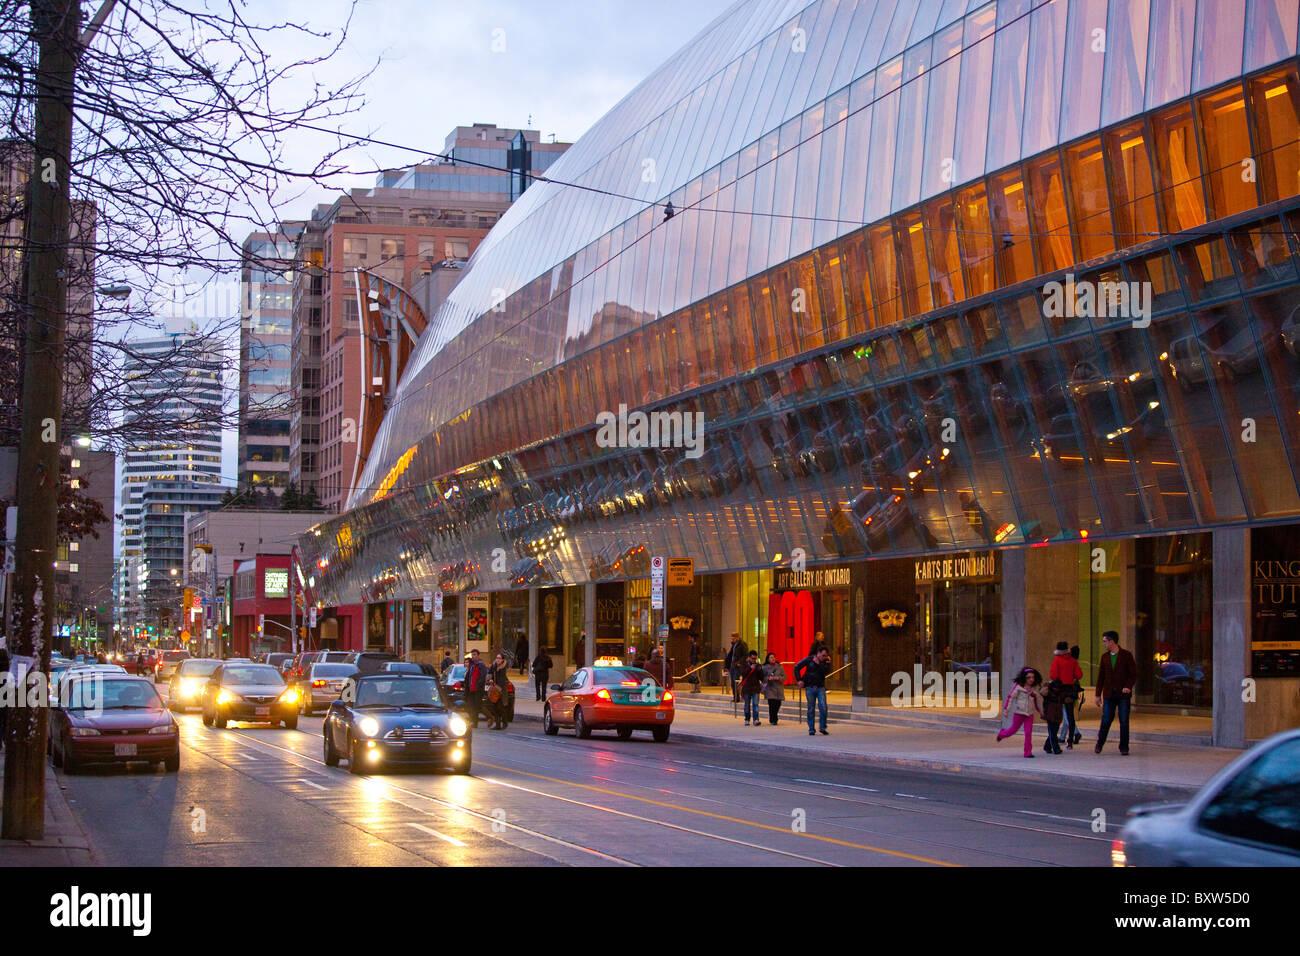 Galería De Arte De Ontario En Toronto: AGO, Art Gallery Of Ontario, Toronto, Canada Stock Photo